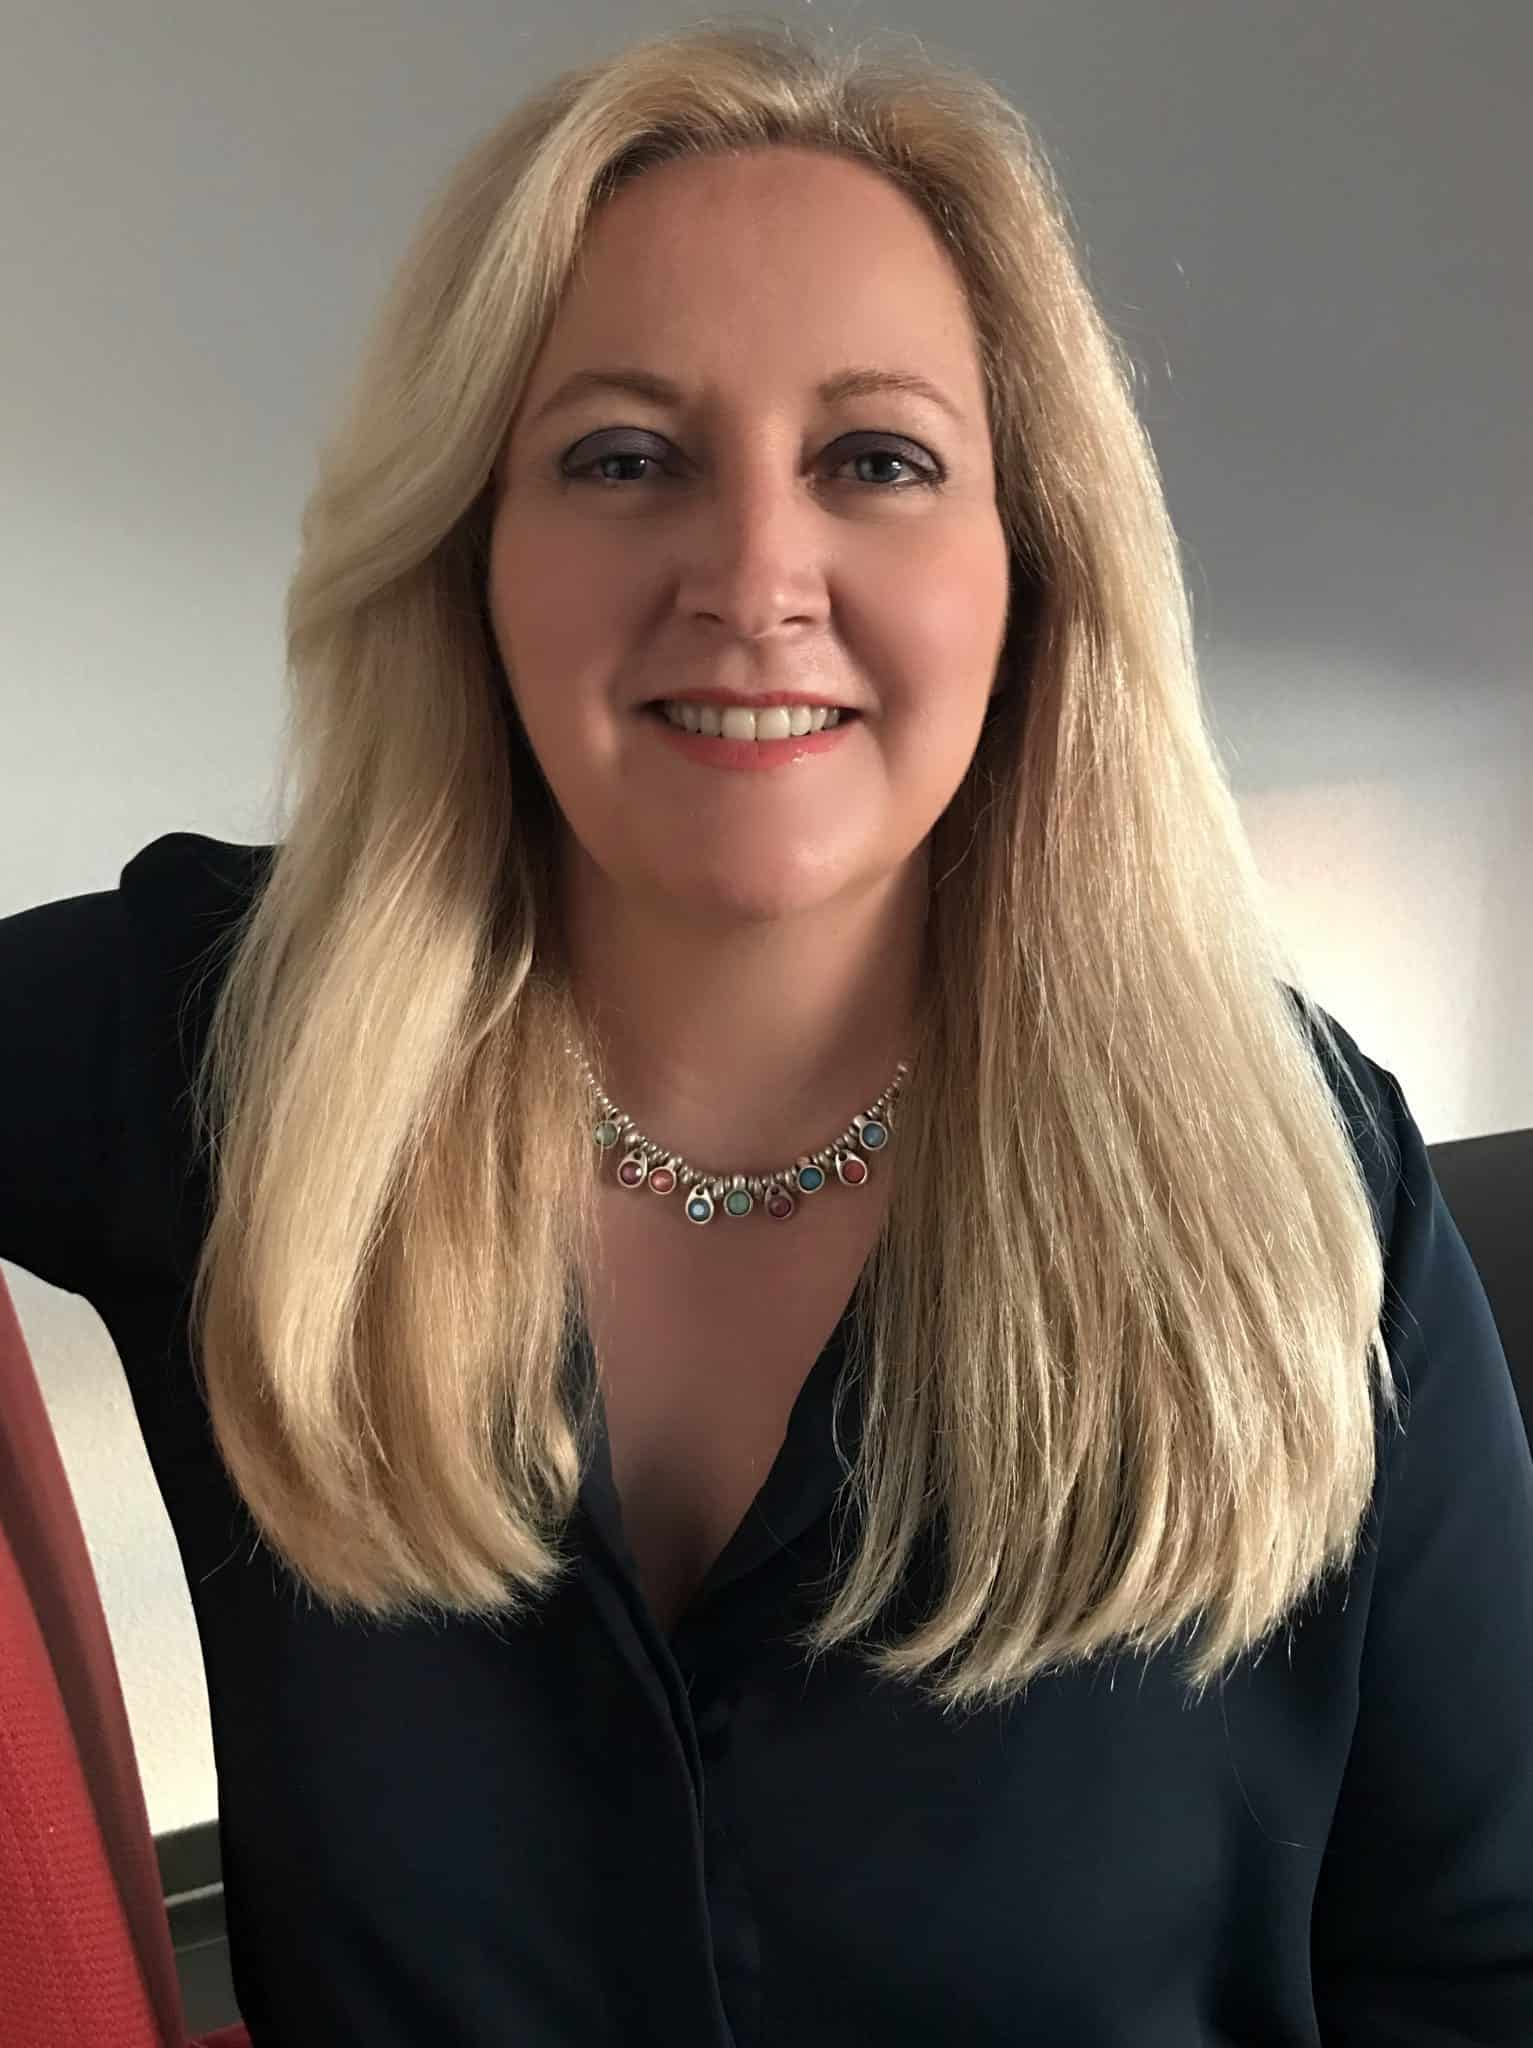 Elena Remigi, author of 'In Limbo'